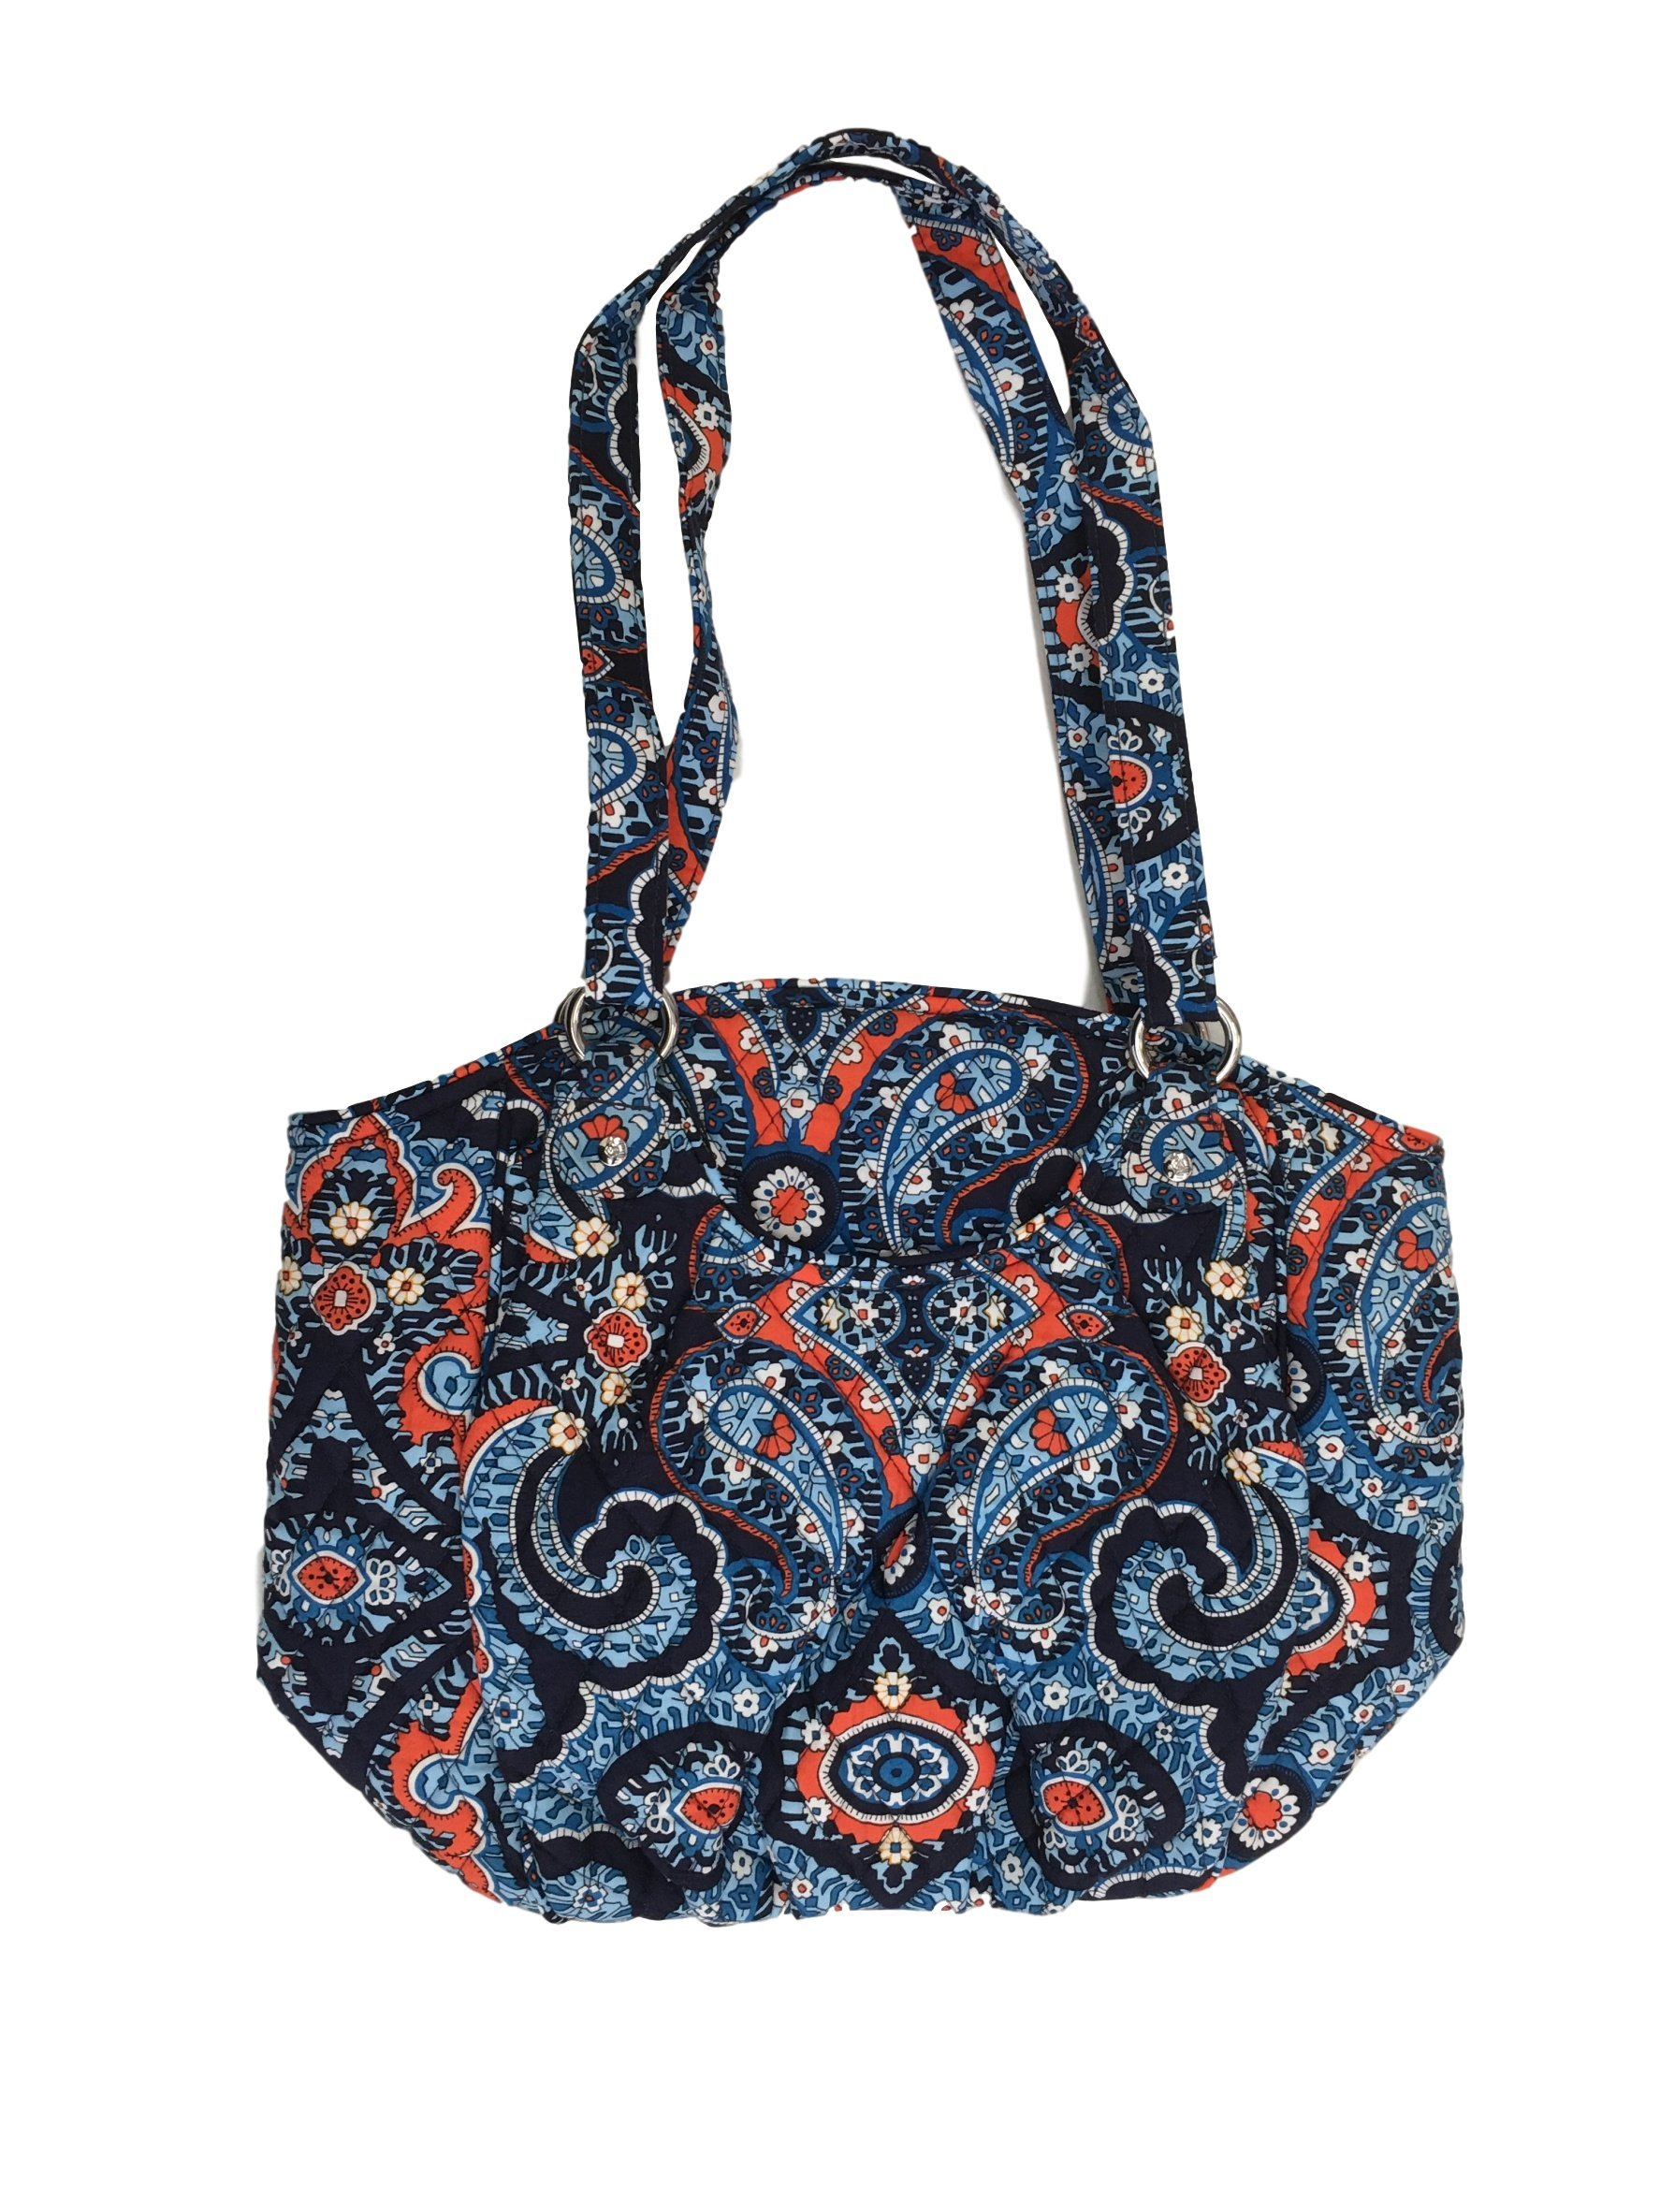 Vera Bradley Glenna Shoulder Bag, Signature Cotton (Marrakesh)